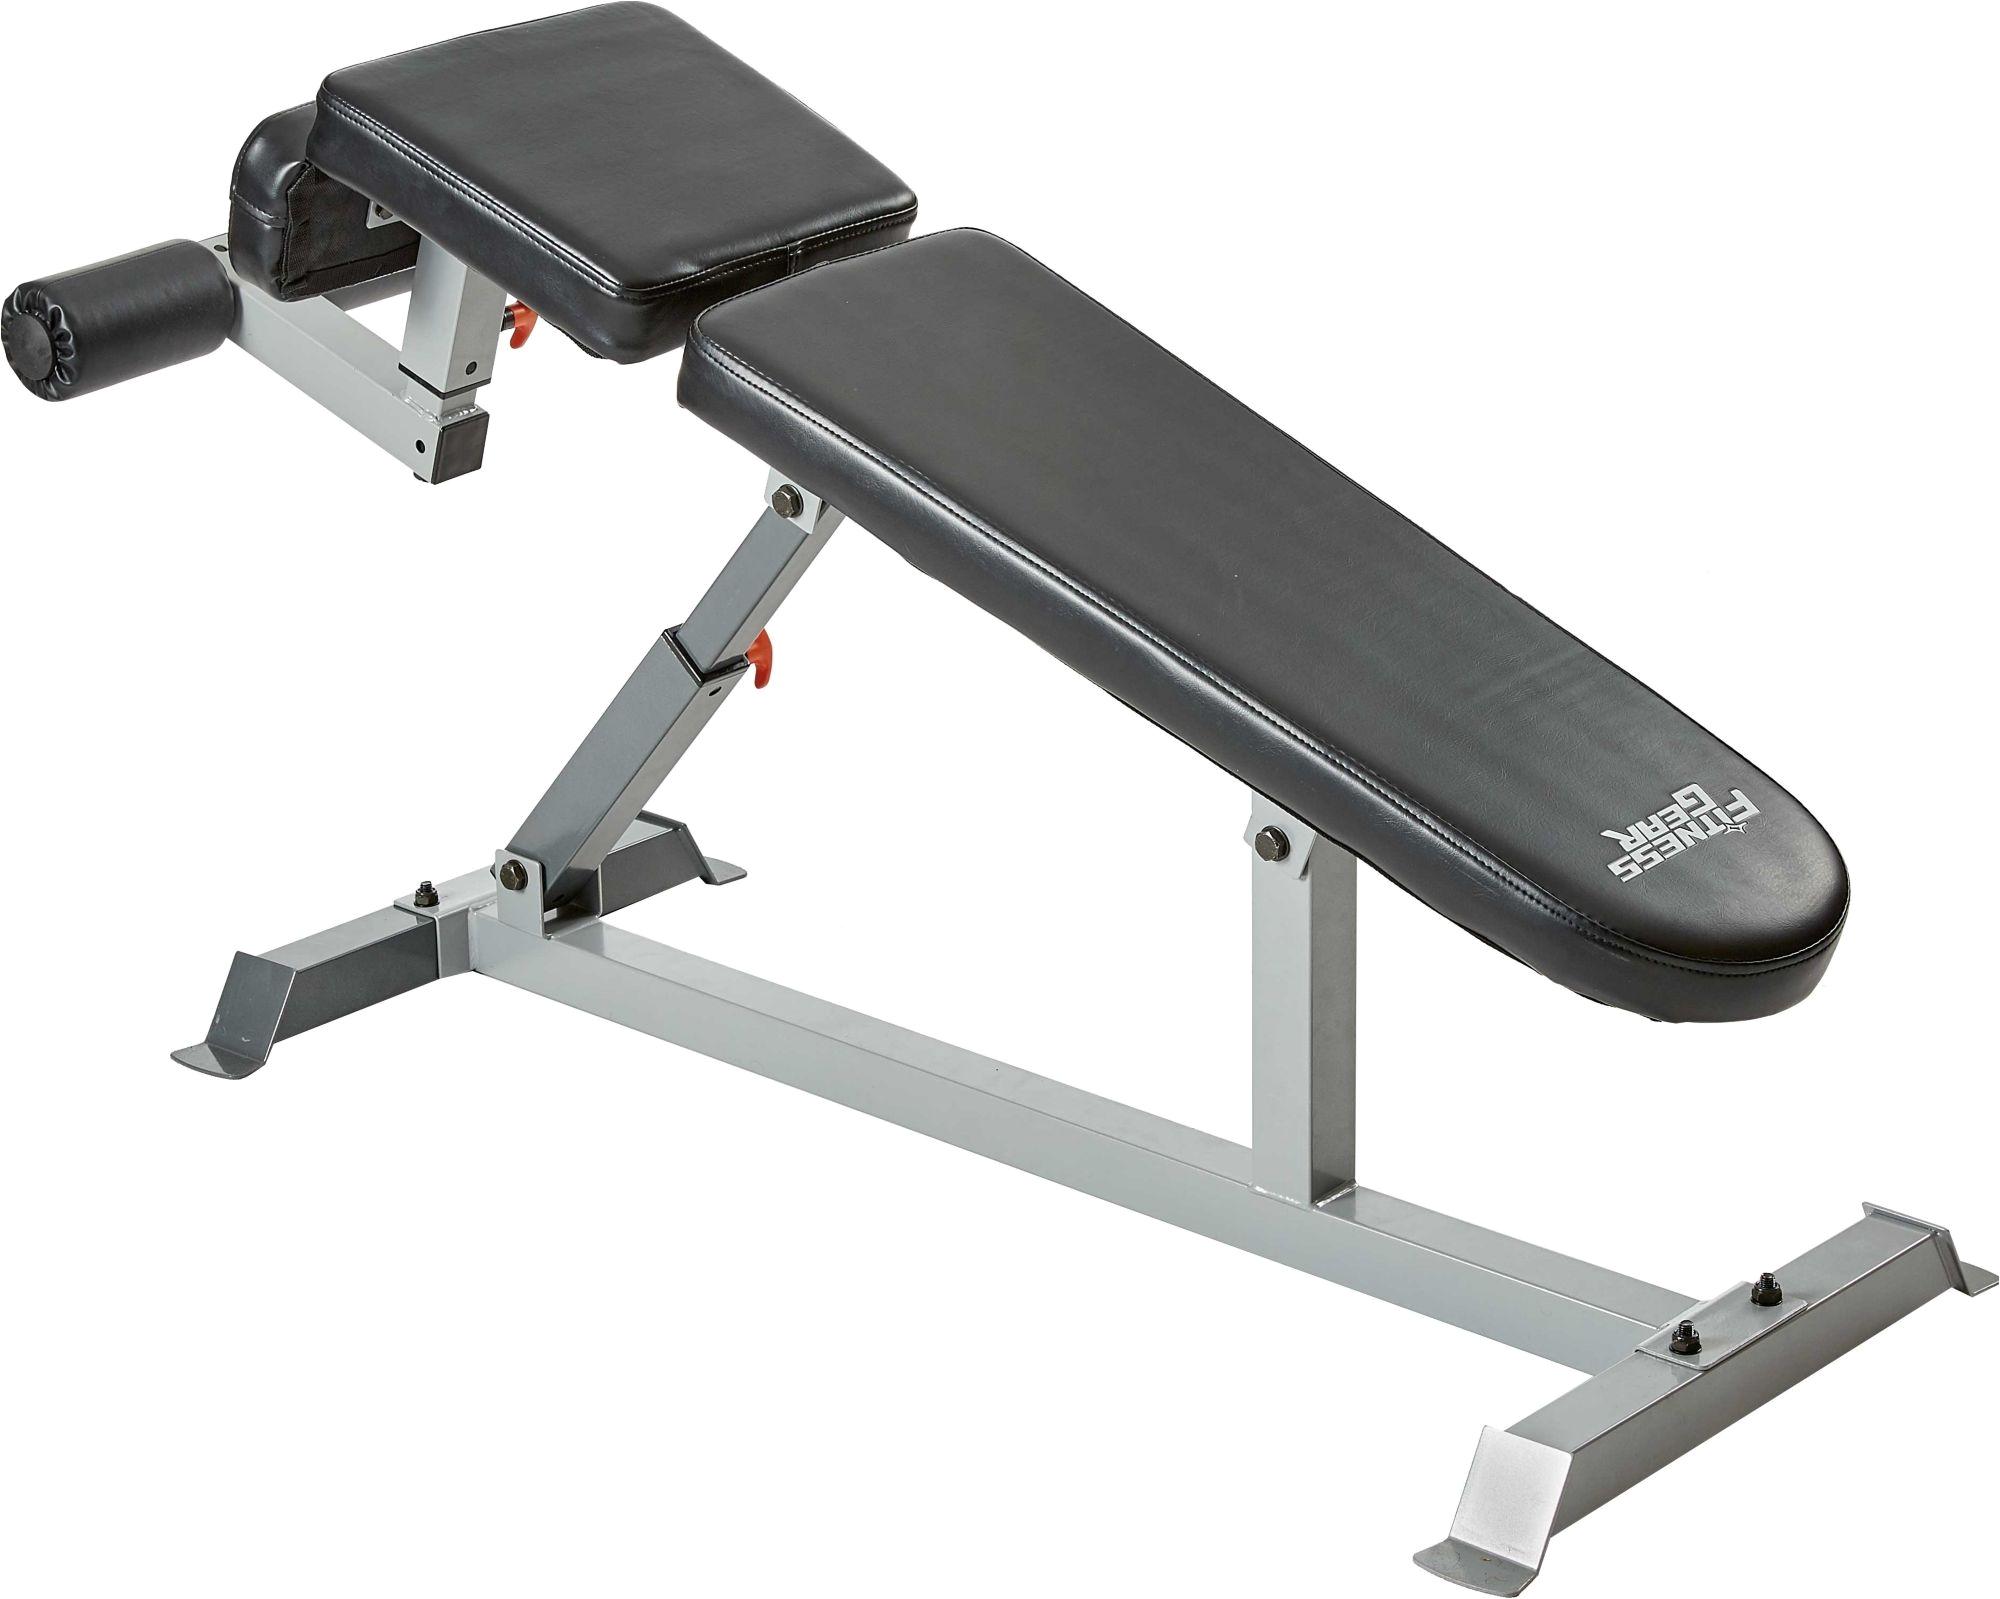 Dicks Weight Bench Fitness Gear Pro Core Weight Bench Dicks Sporting Goods